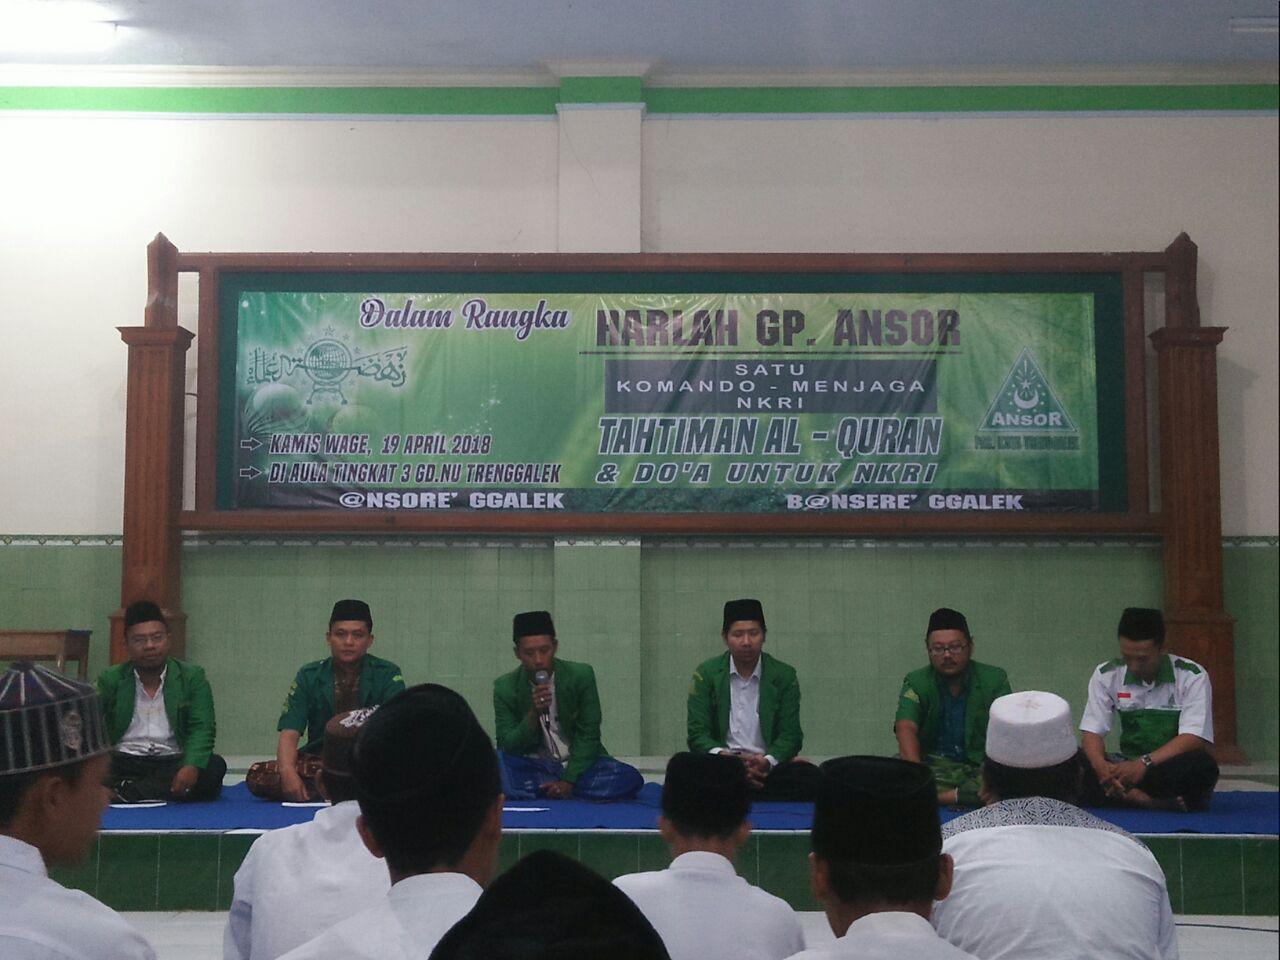 PAC GP Ansor Kota Trenggalek memperingati Harlah GP Ansor dengan khotmil Qur'an bil ghaib dan istigotsah di aula Gedung NU pada Kamis (19/4/2018) kemarin.